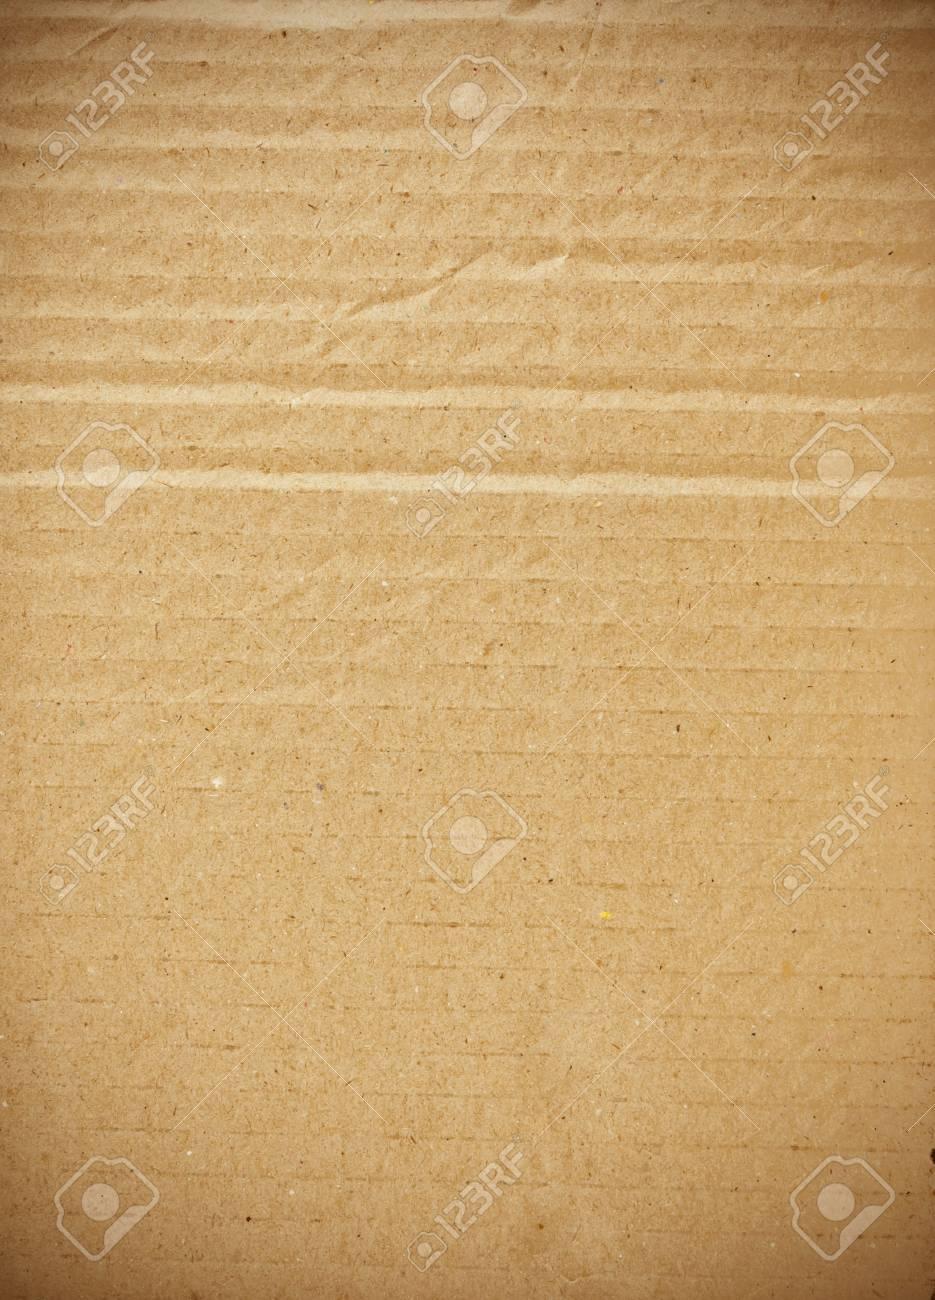 piece of corrugated cardboard Stock Photo - 9401351